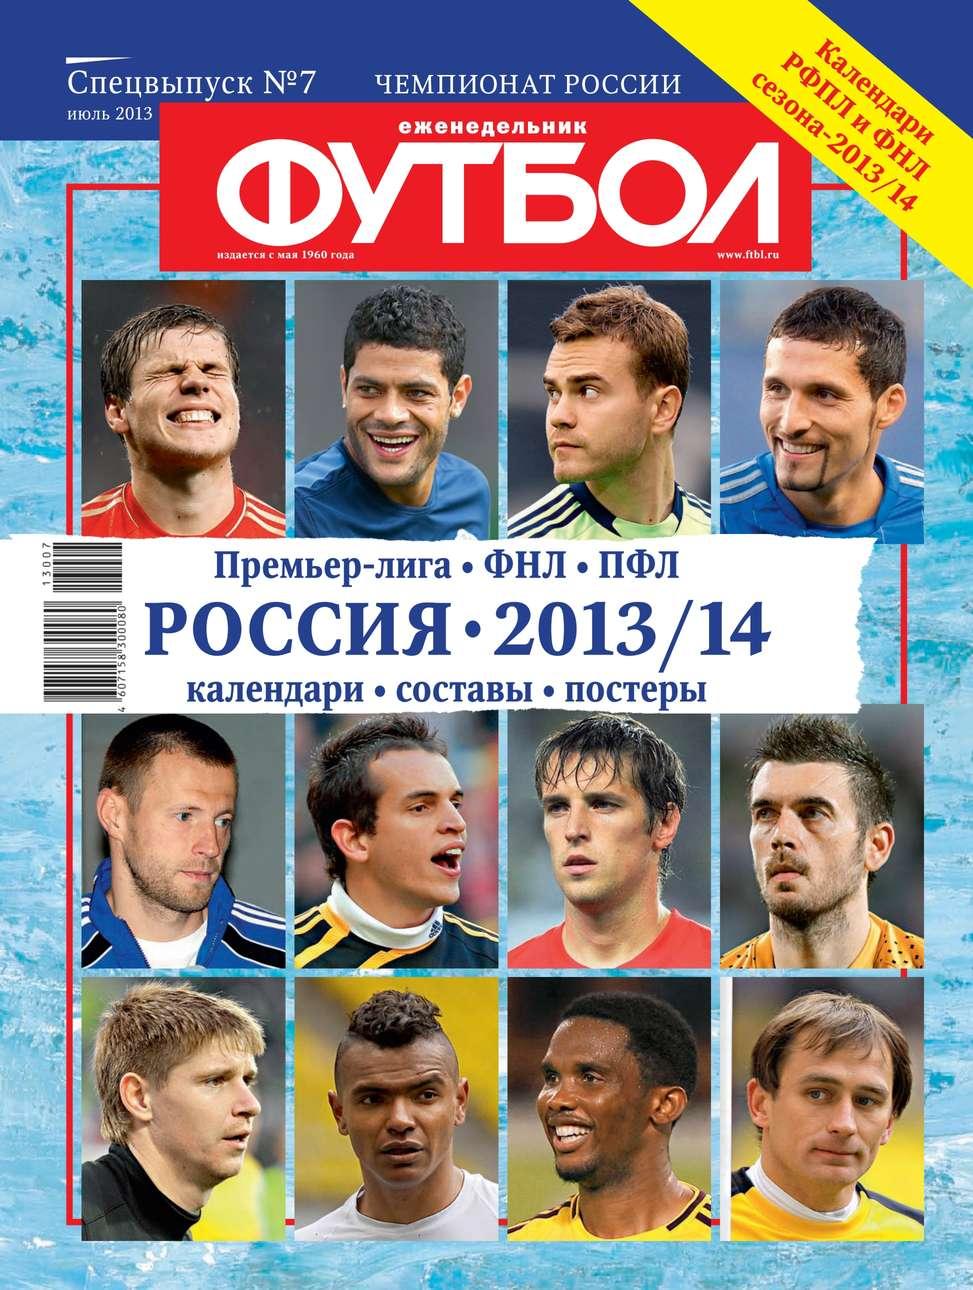 Редакция журнала Футбол Спецвыпуск Футбол Спецвыпуск 07-2013 футбол